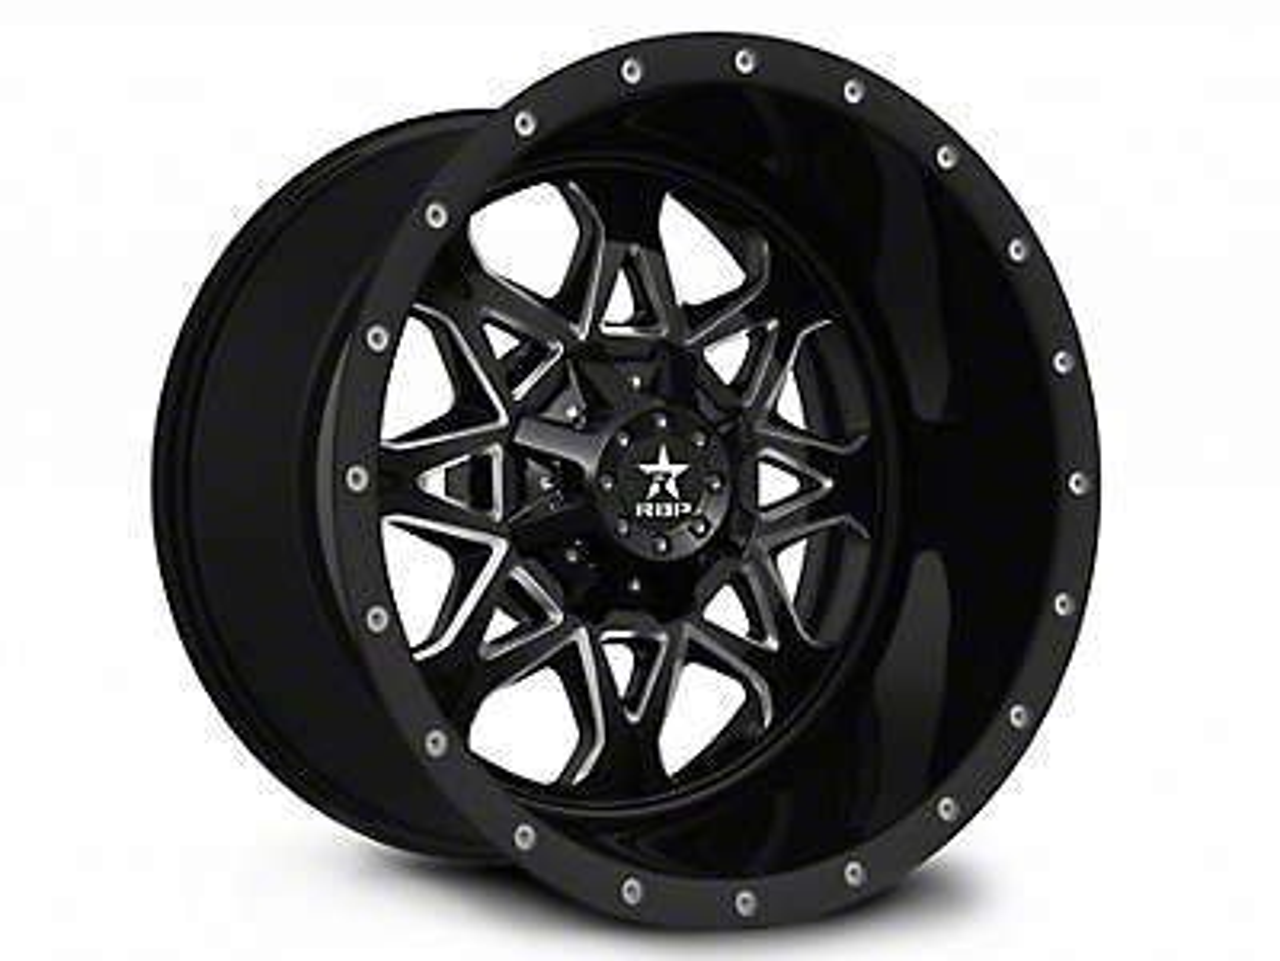 RBP 79R Assault Black 6-Lug Wheel - 20x10 (07-18 Sierra 1500)